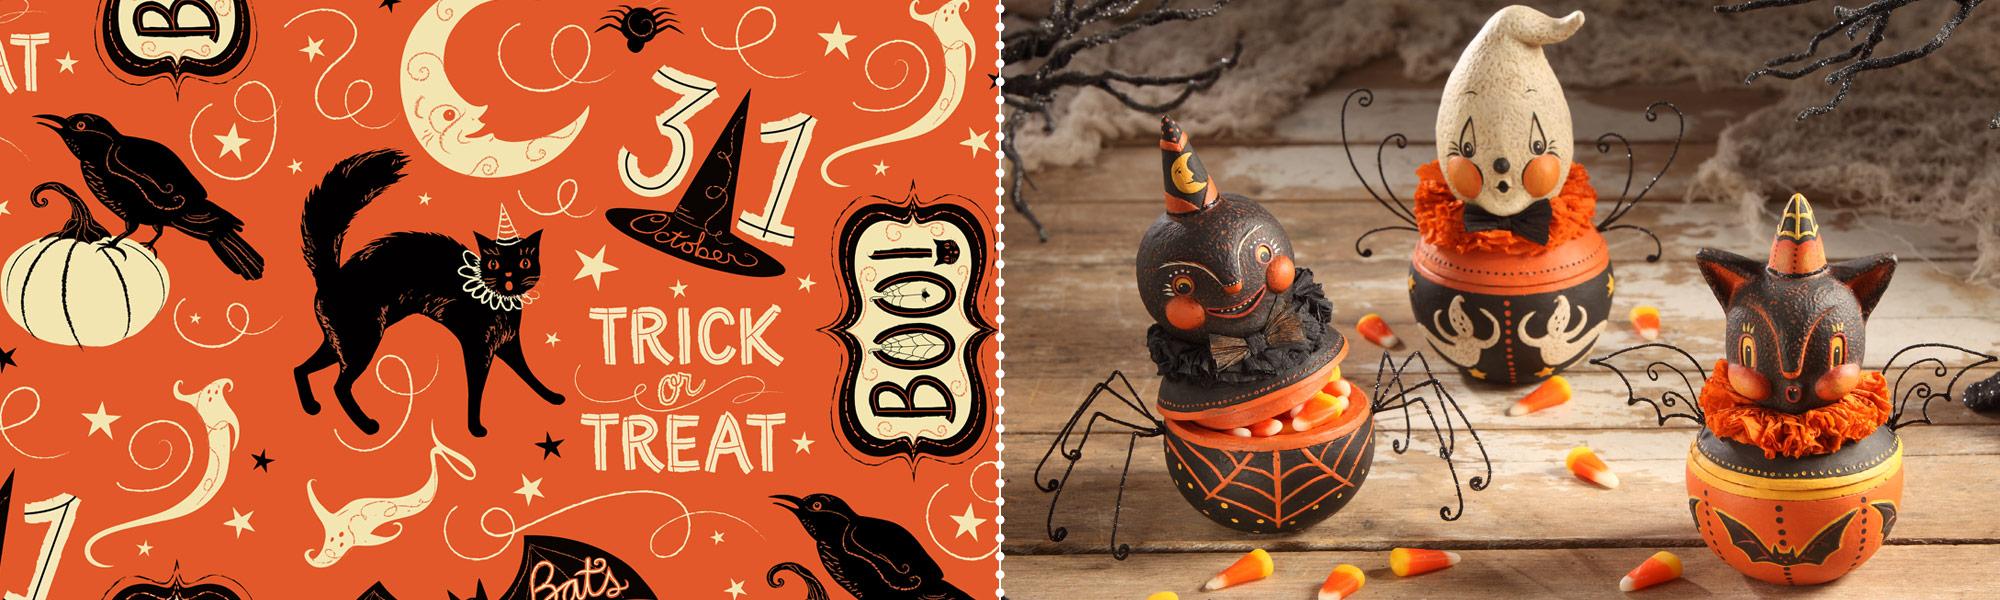 Resource-Guide-Halloween-Banner3.jpg